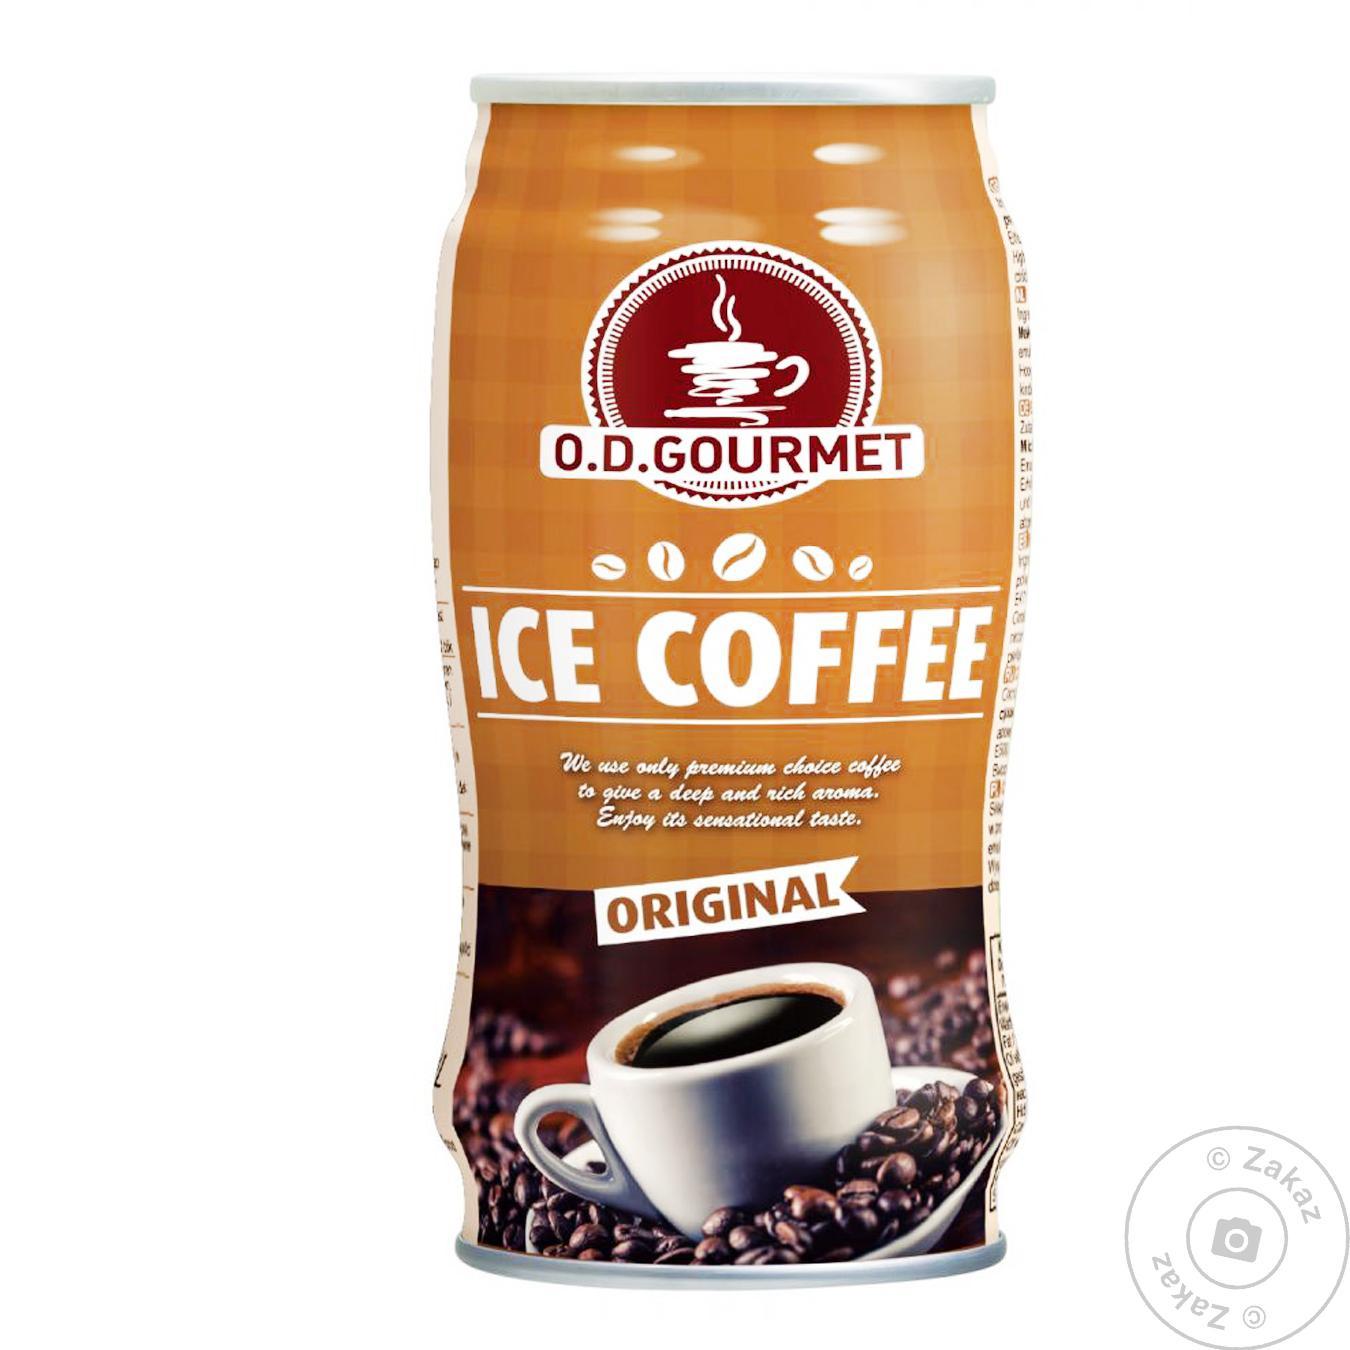 O.D.Gourmet / Кофе холодный O.D. Gourmet Ice Coffe Original 240мл